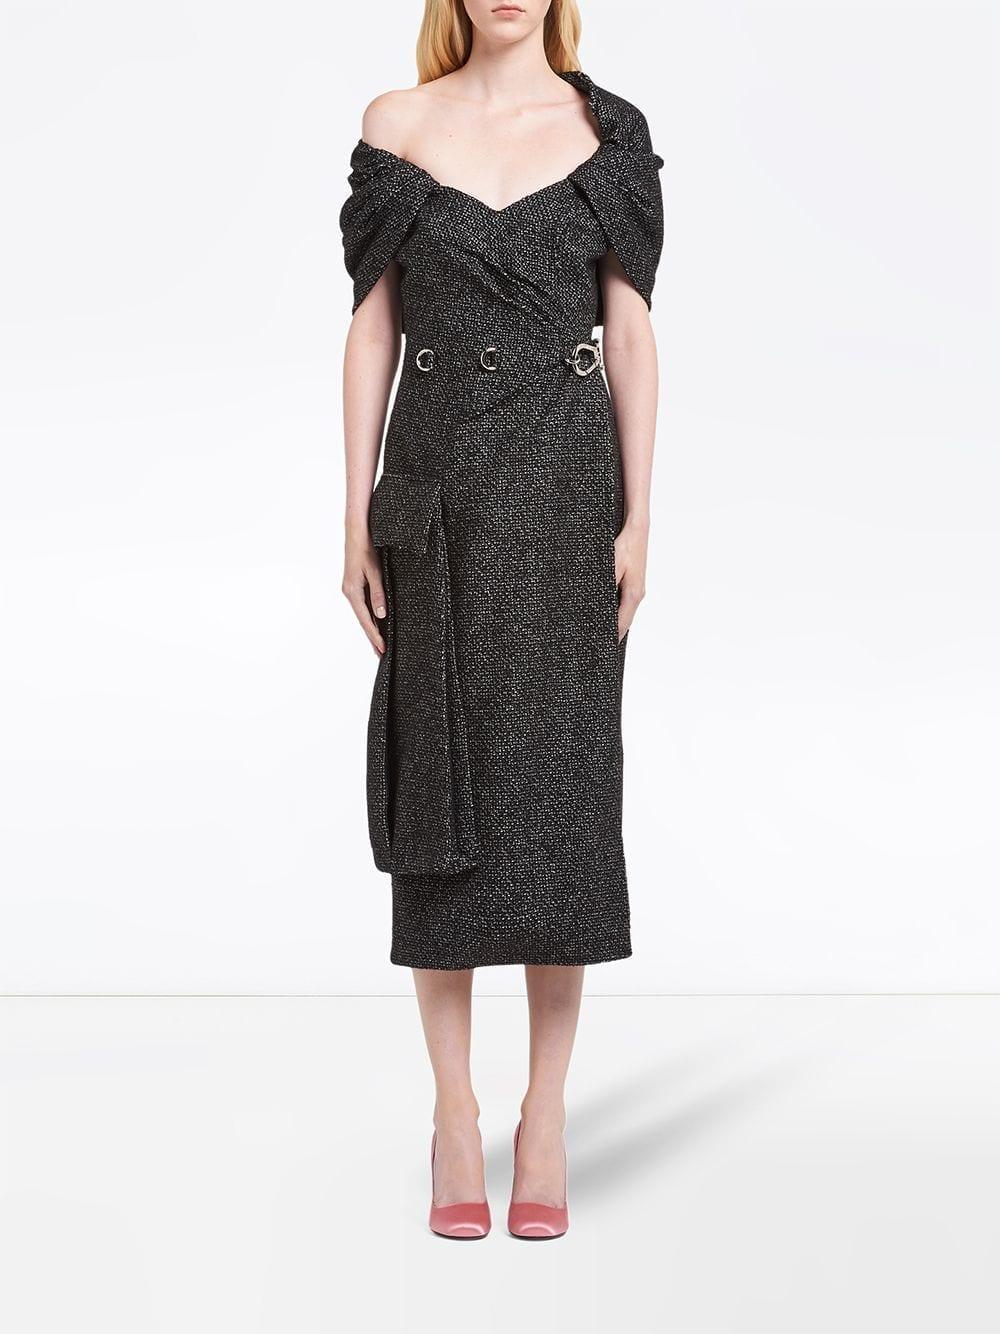 PRADA Chevron Motif Sheath Dress